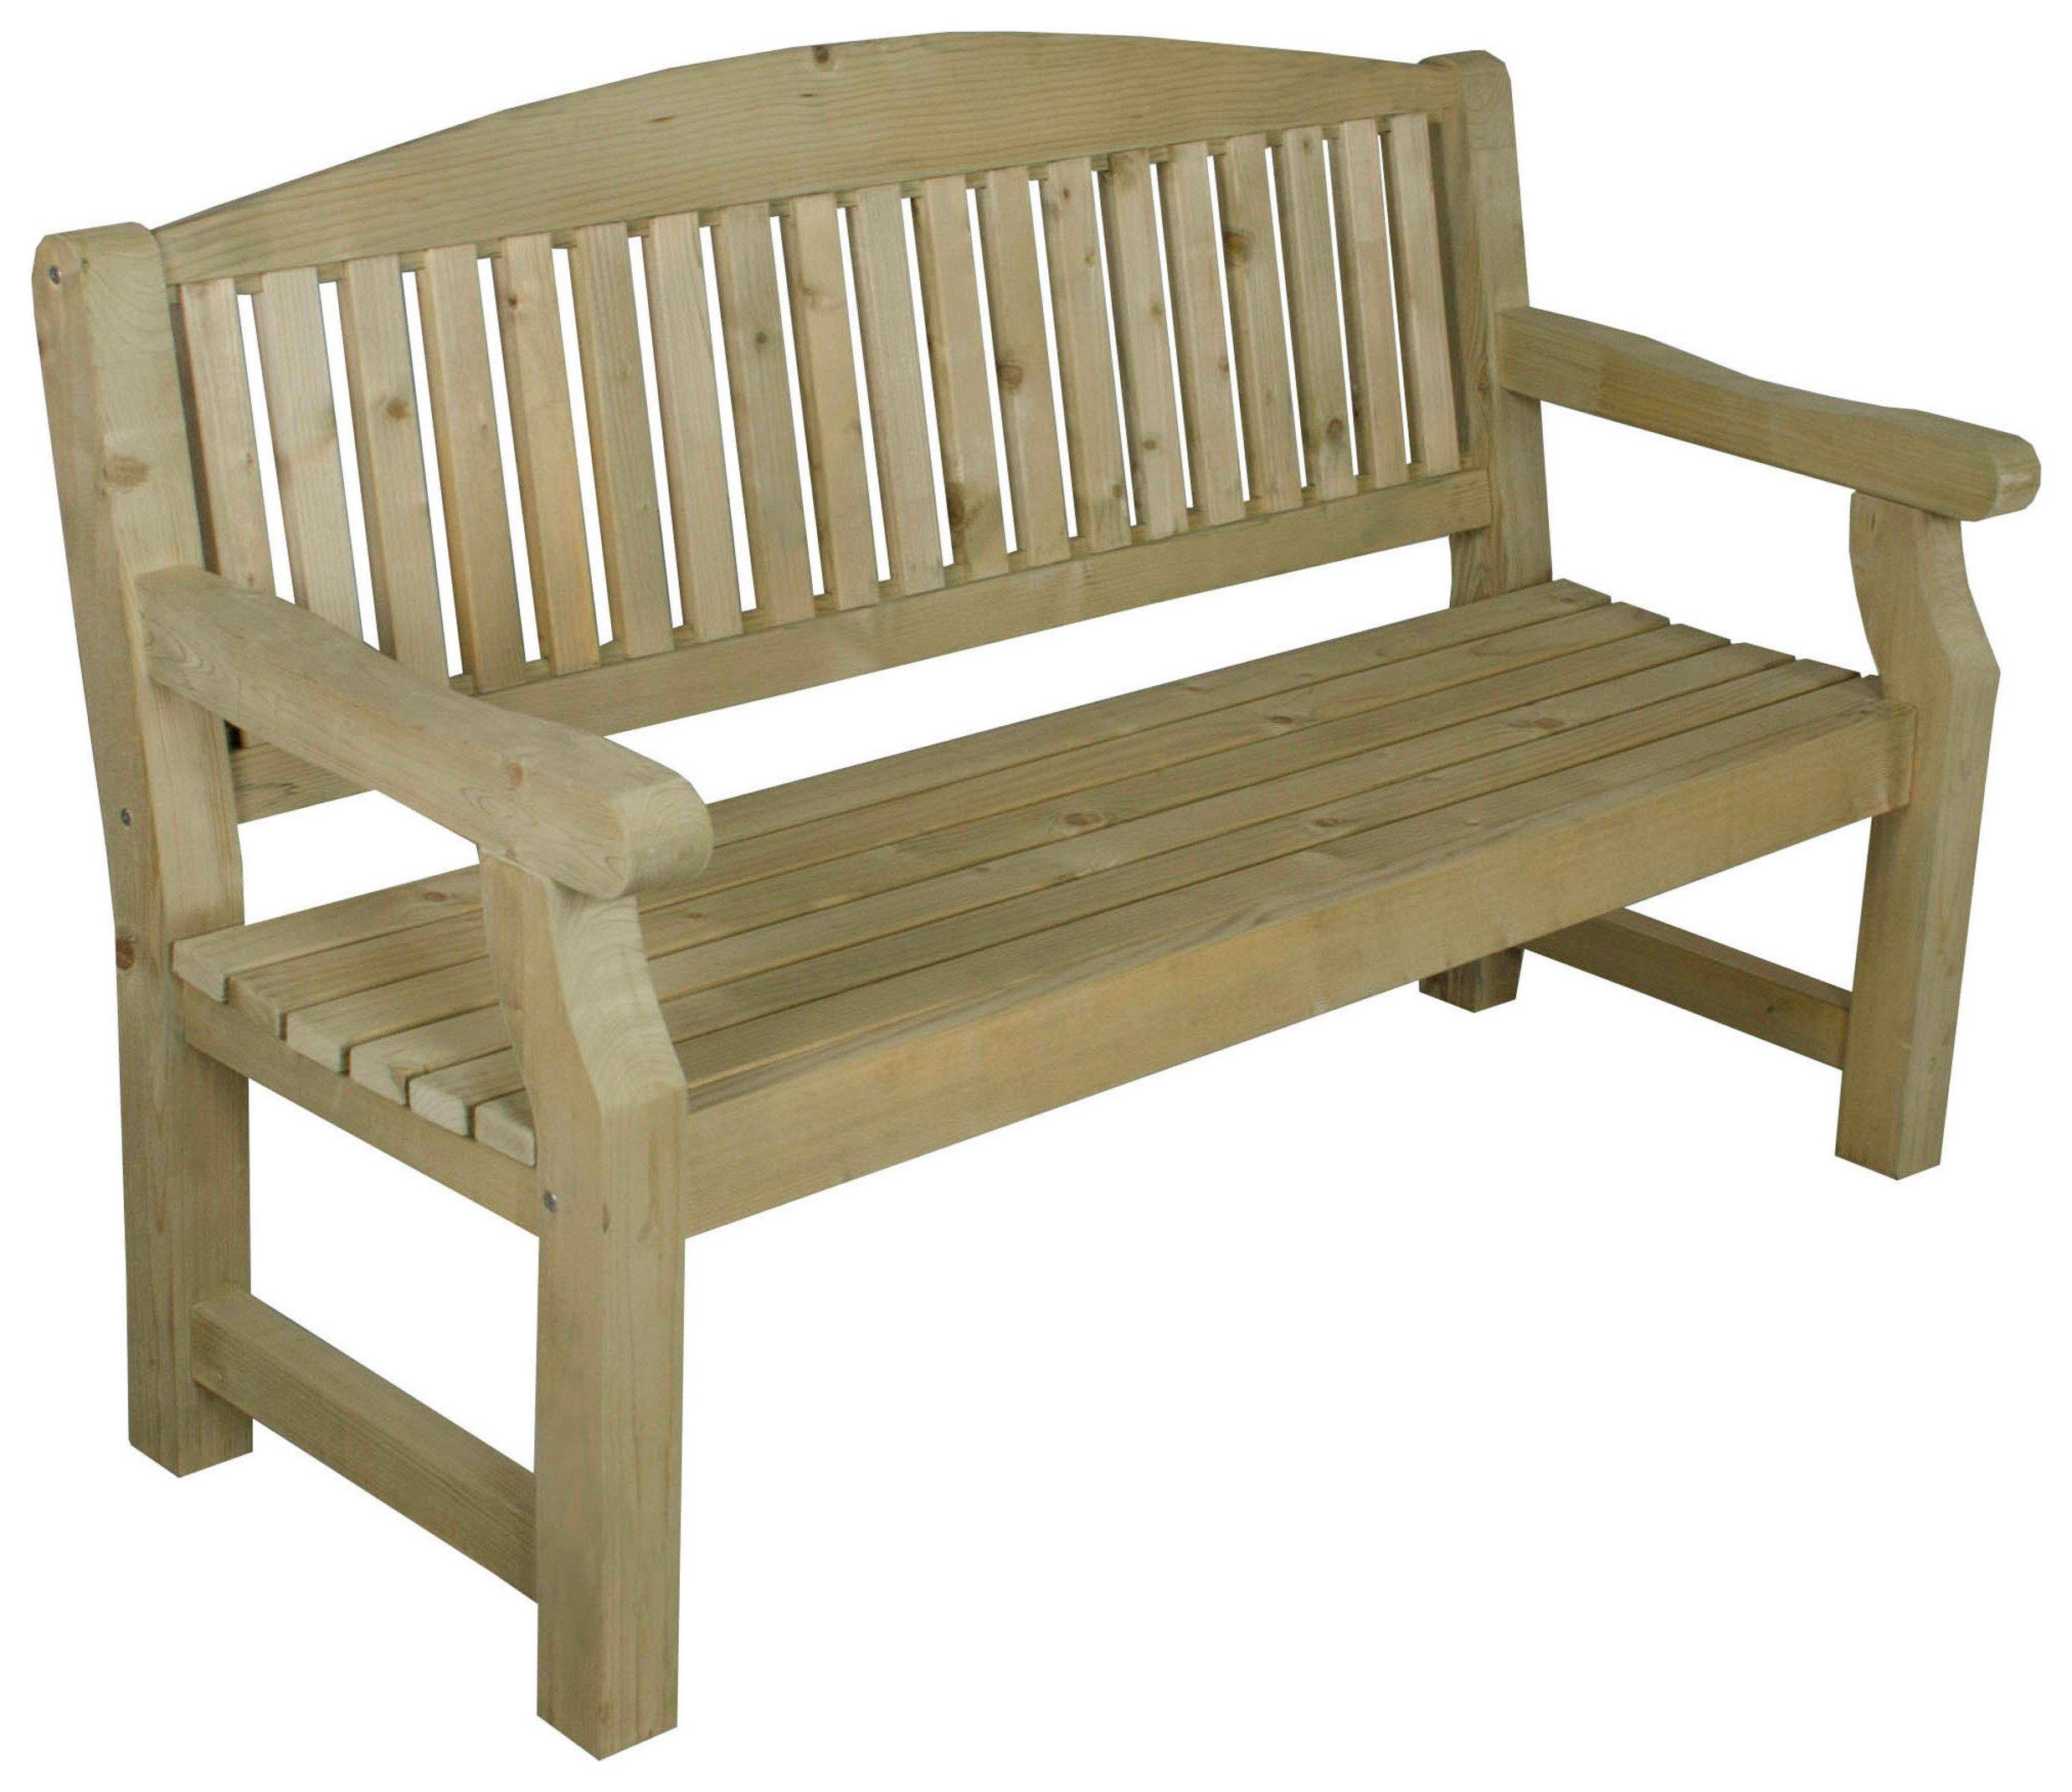 Argos Garden Bench: SALE On Forest 5ft Harvington Garden Bench